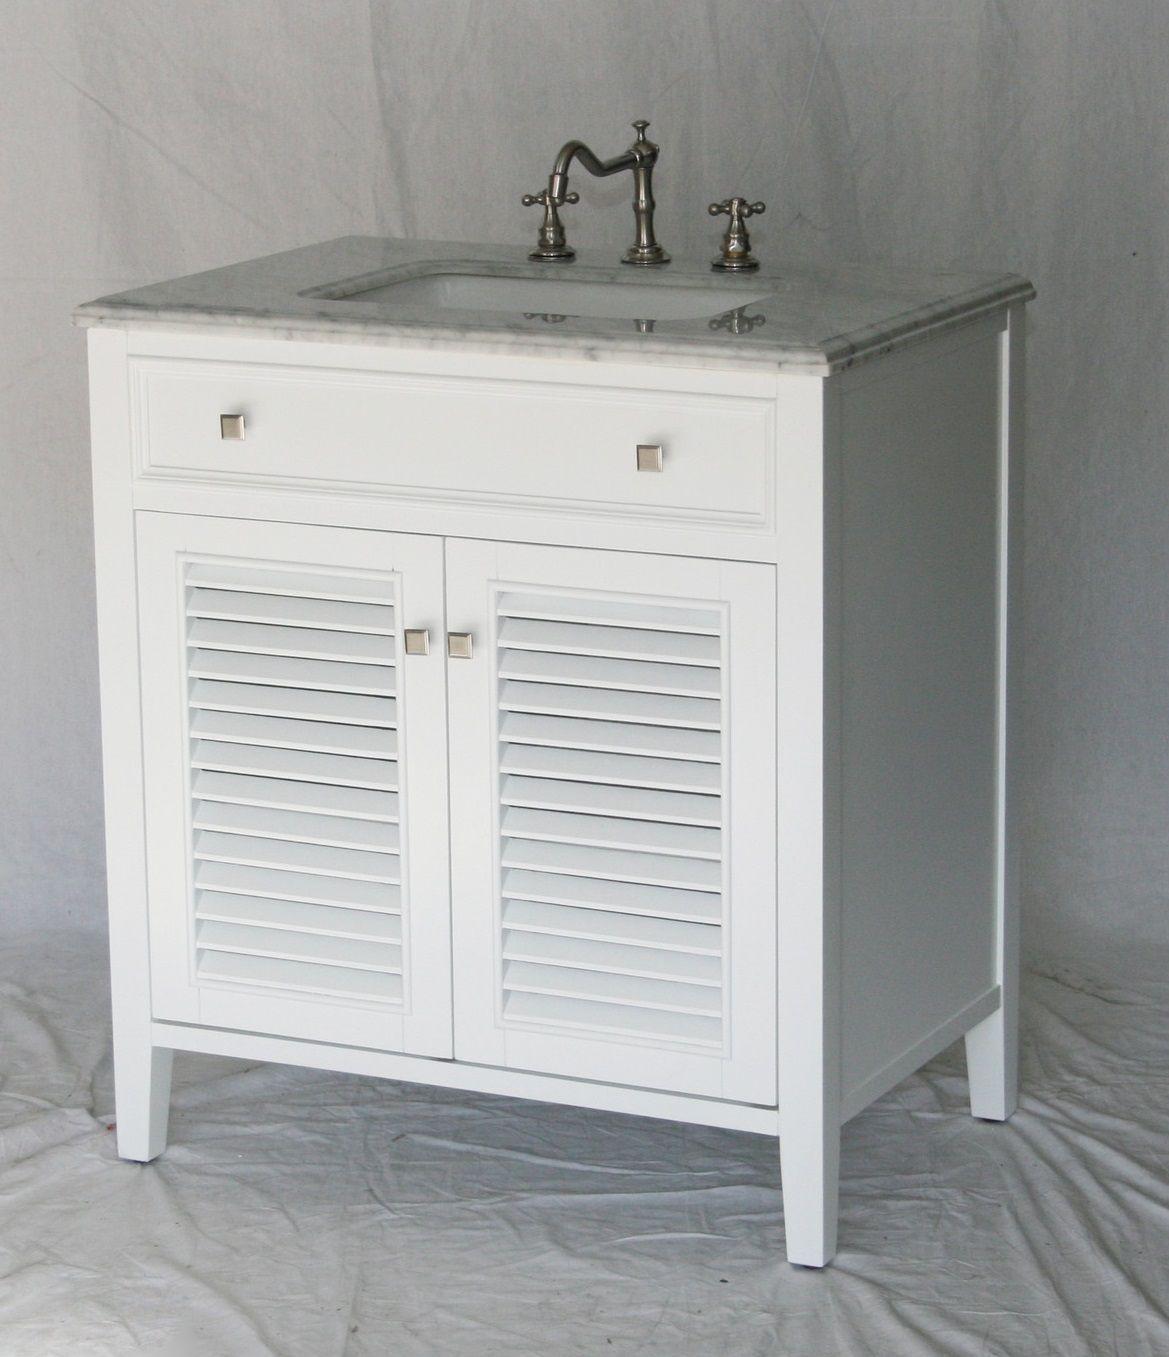 32 inch bathroom vanity pure white coastal cottage beach style 32wx21dx35h s332832w